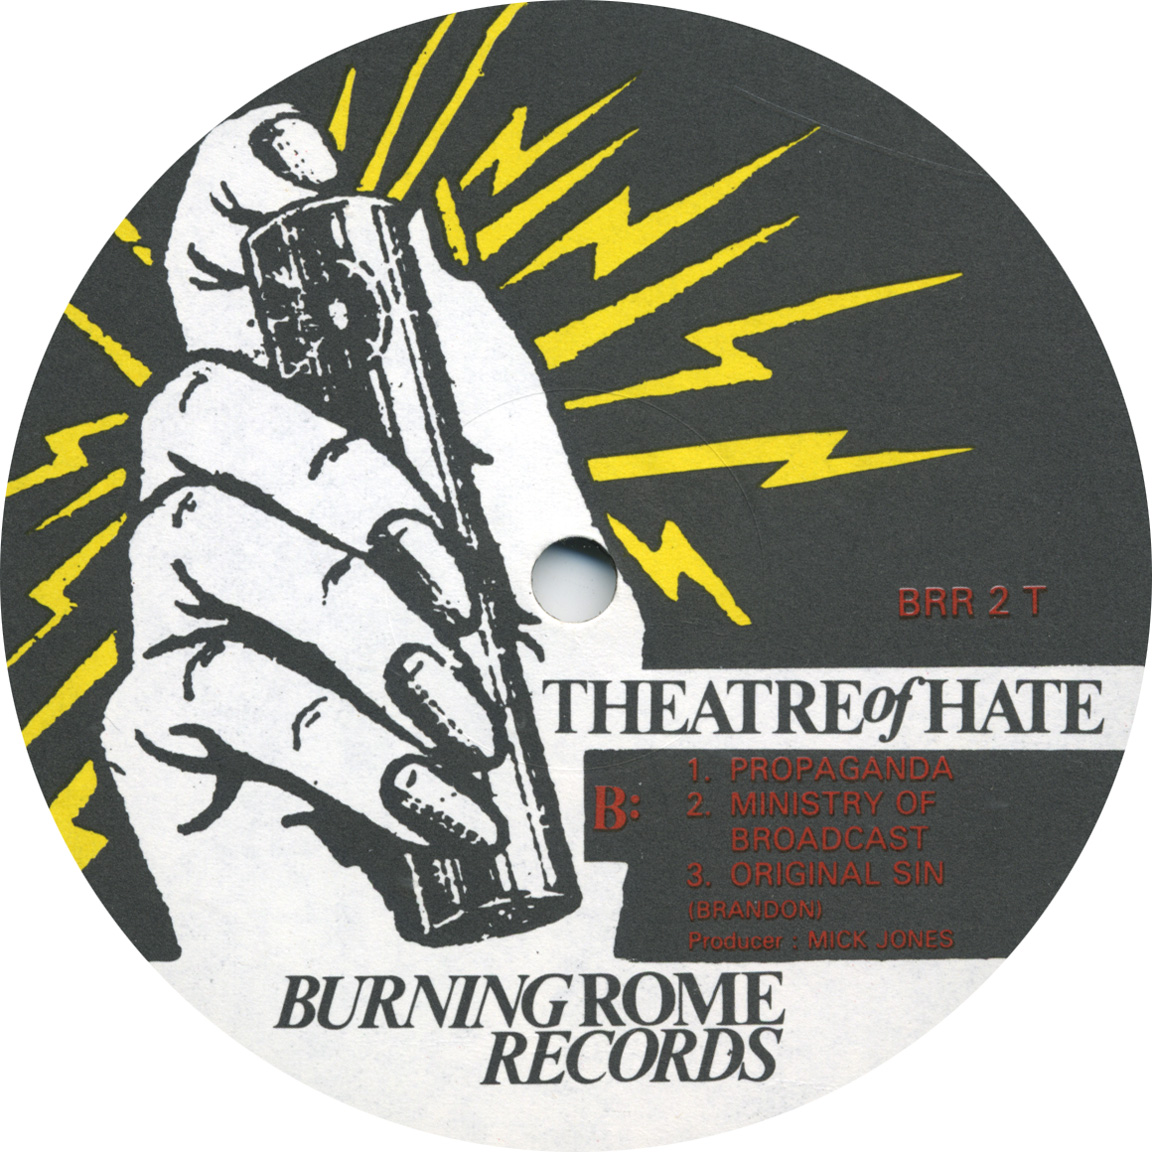 Theatre Of Hate Westworld